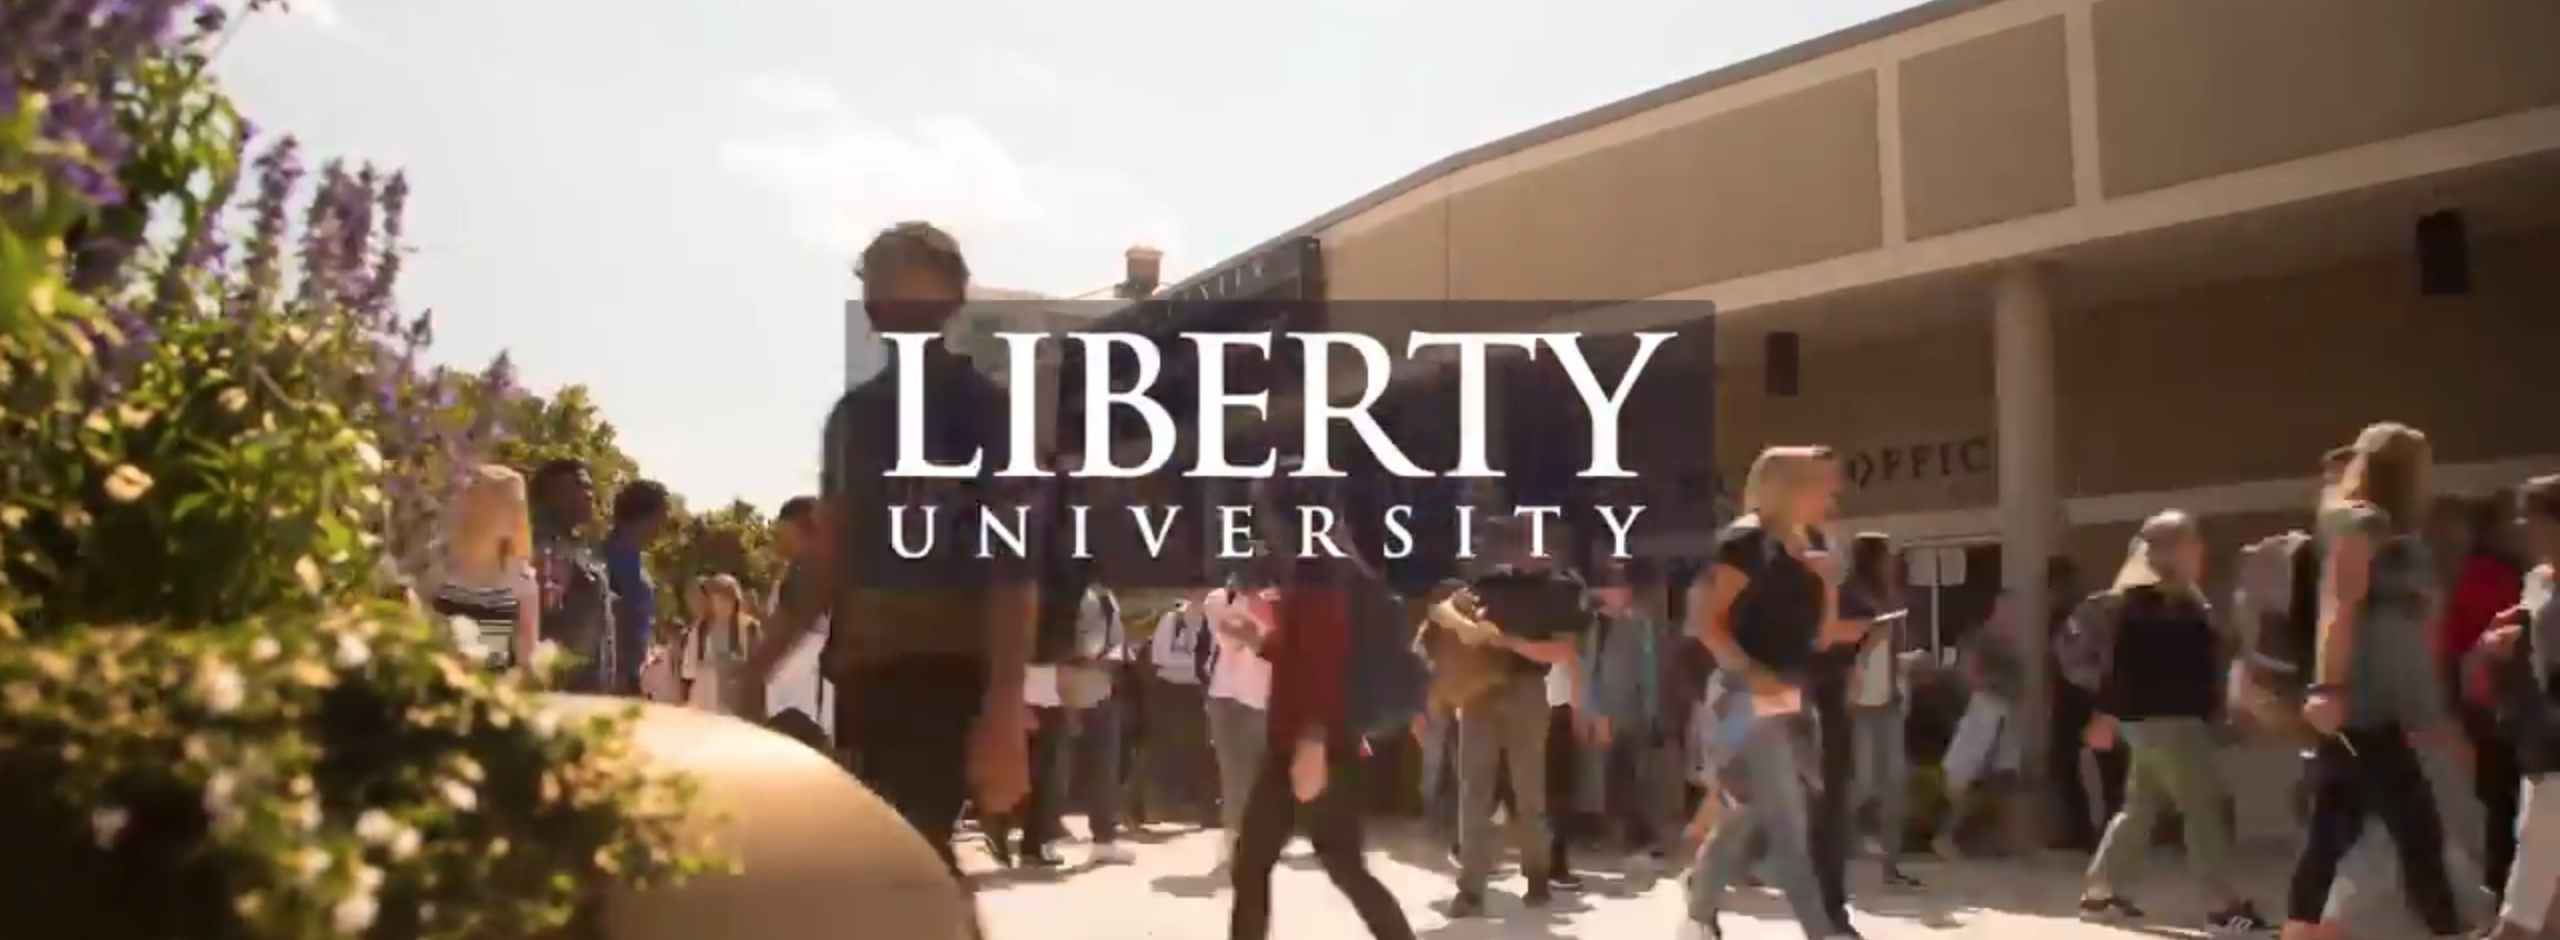 Liberty University | Quick Facts/ YouTube